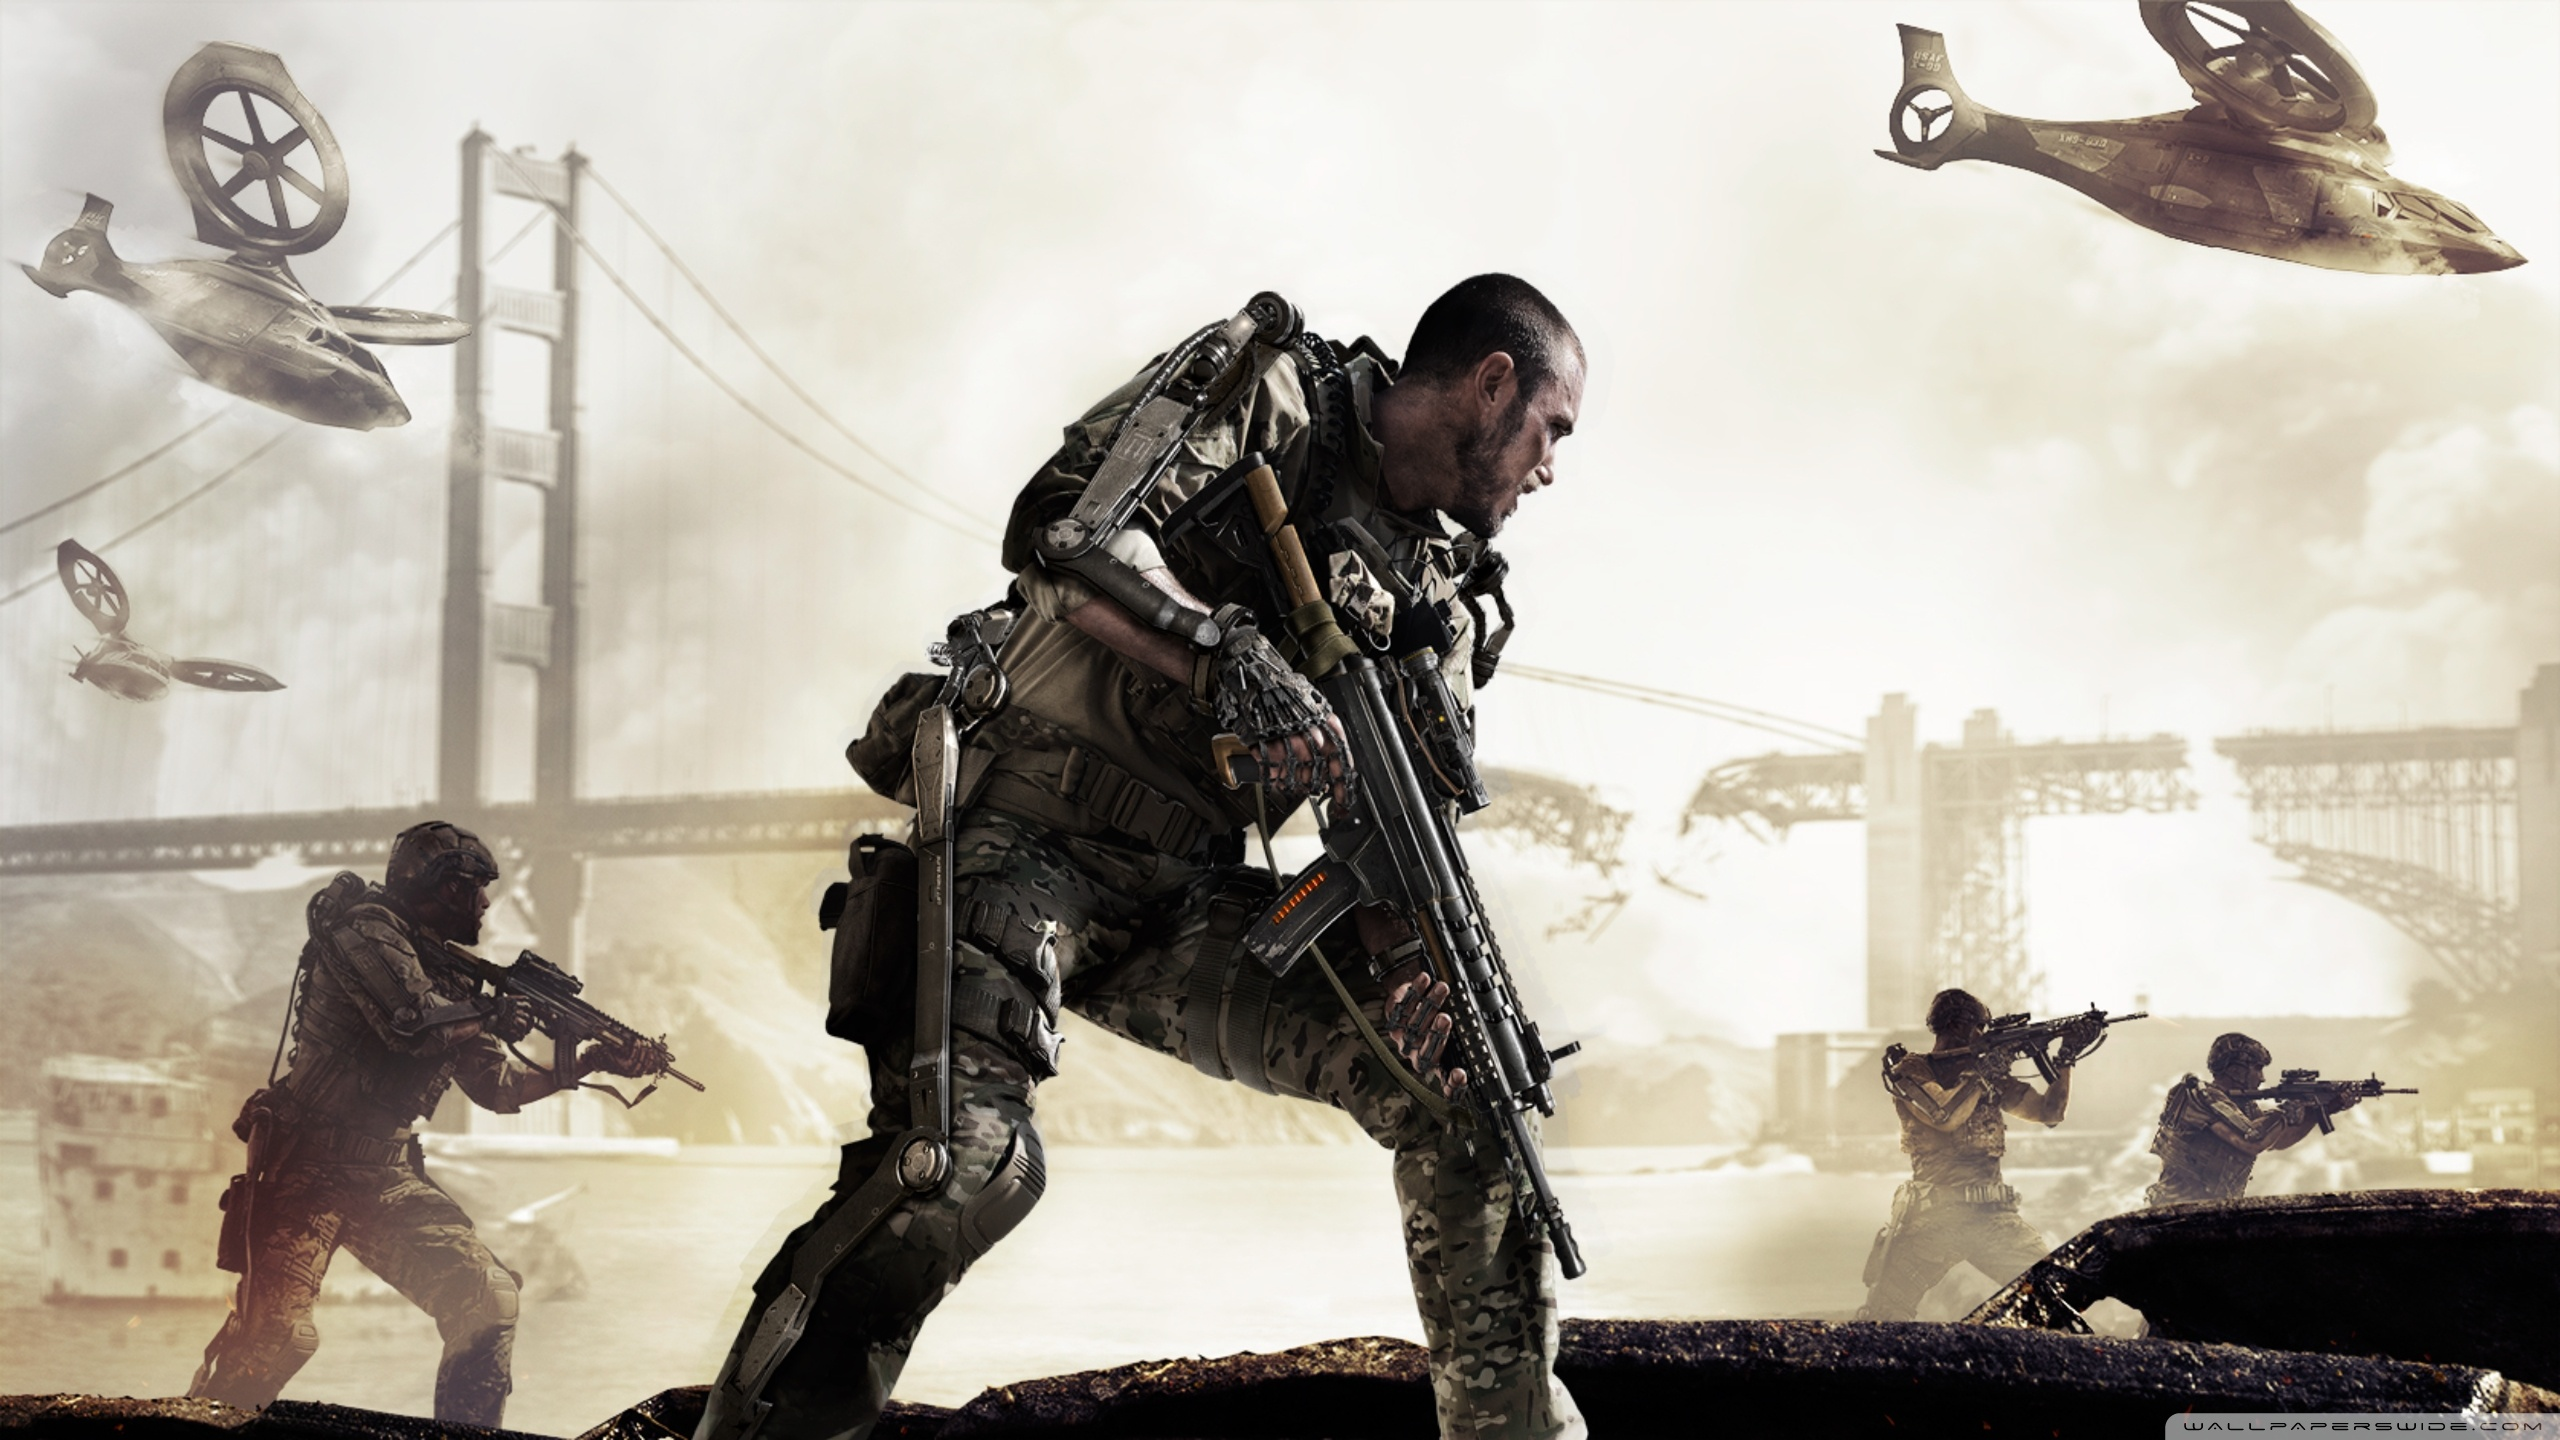 download Call of Duty Advanced Warfare 4K HD Desktop 2560x1440